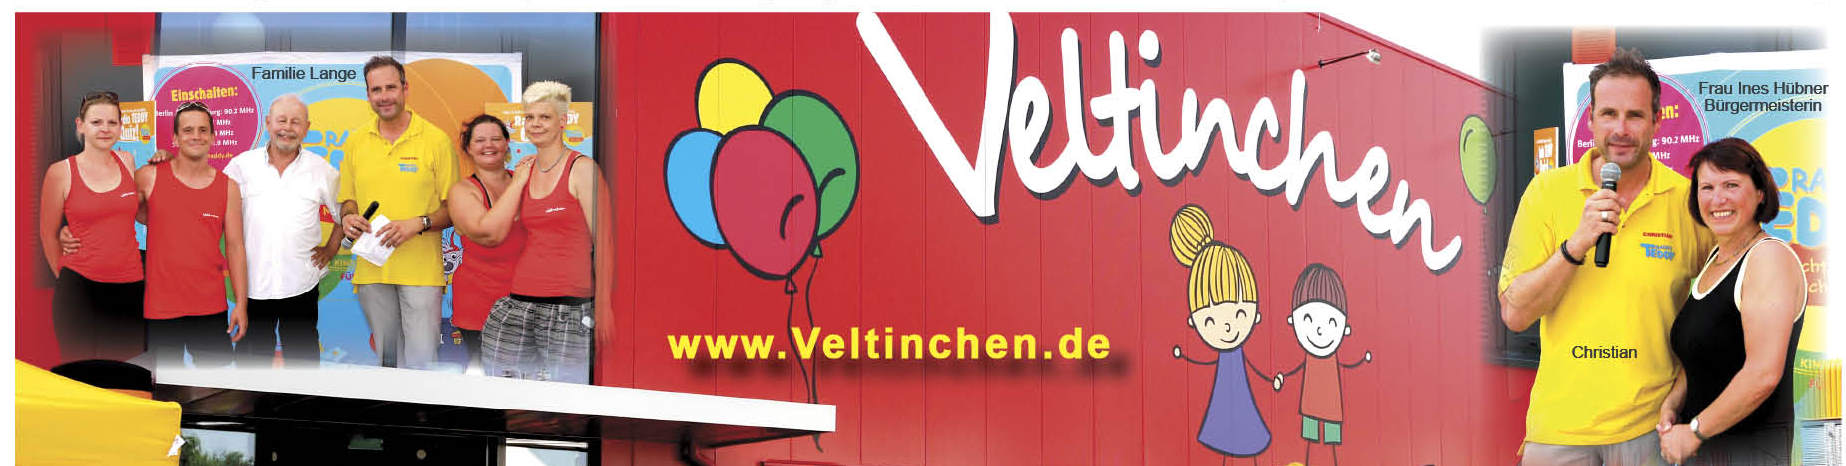 136 wp 03 Veltinchen